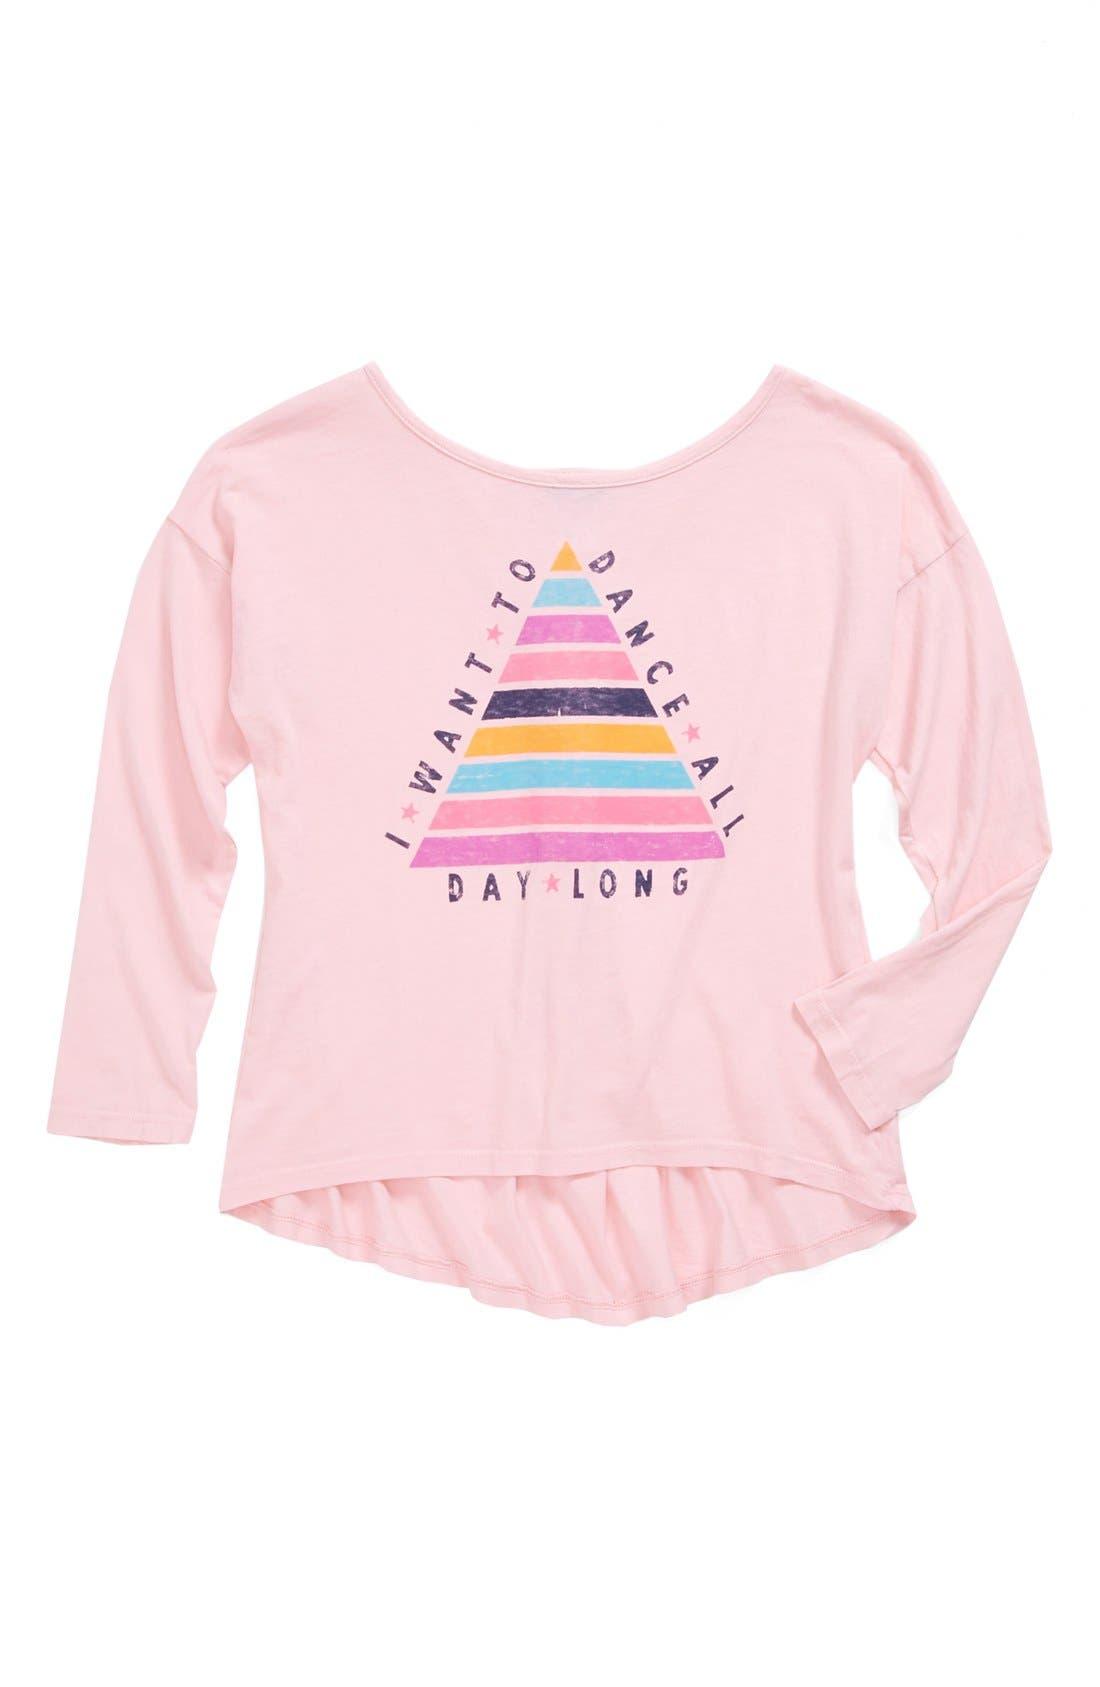 Alternate Image 1 Selected - Junk Food 'I Want to Dance' T-Shirt (Big Girls)